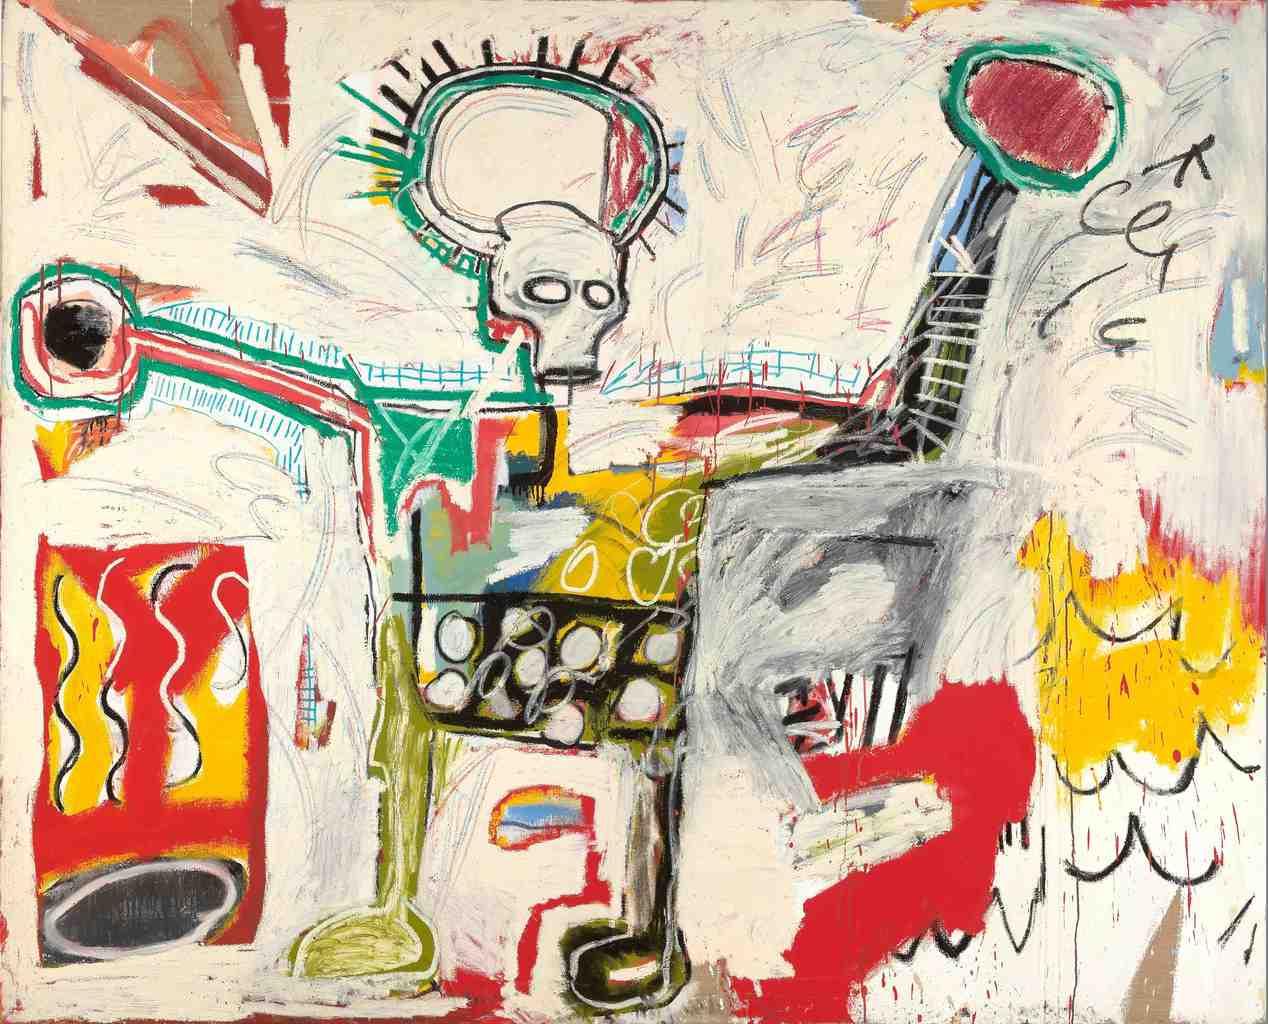 Jean-Michel Basquiat 'Untitled 1982'